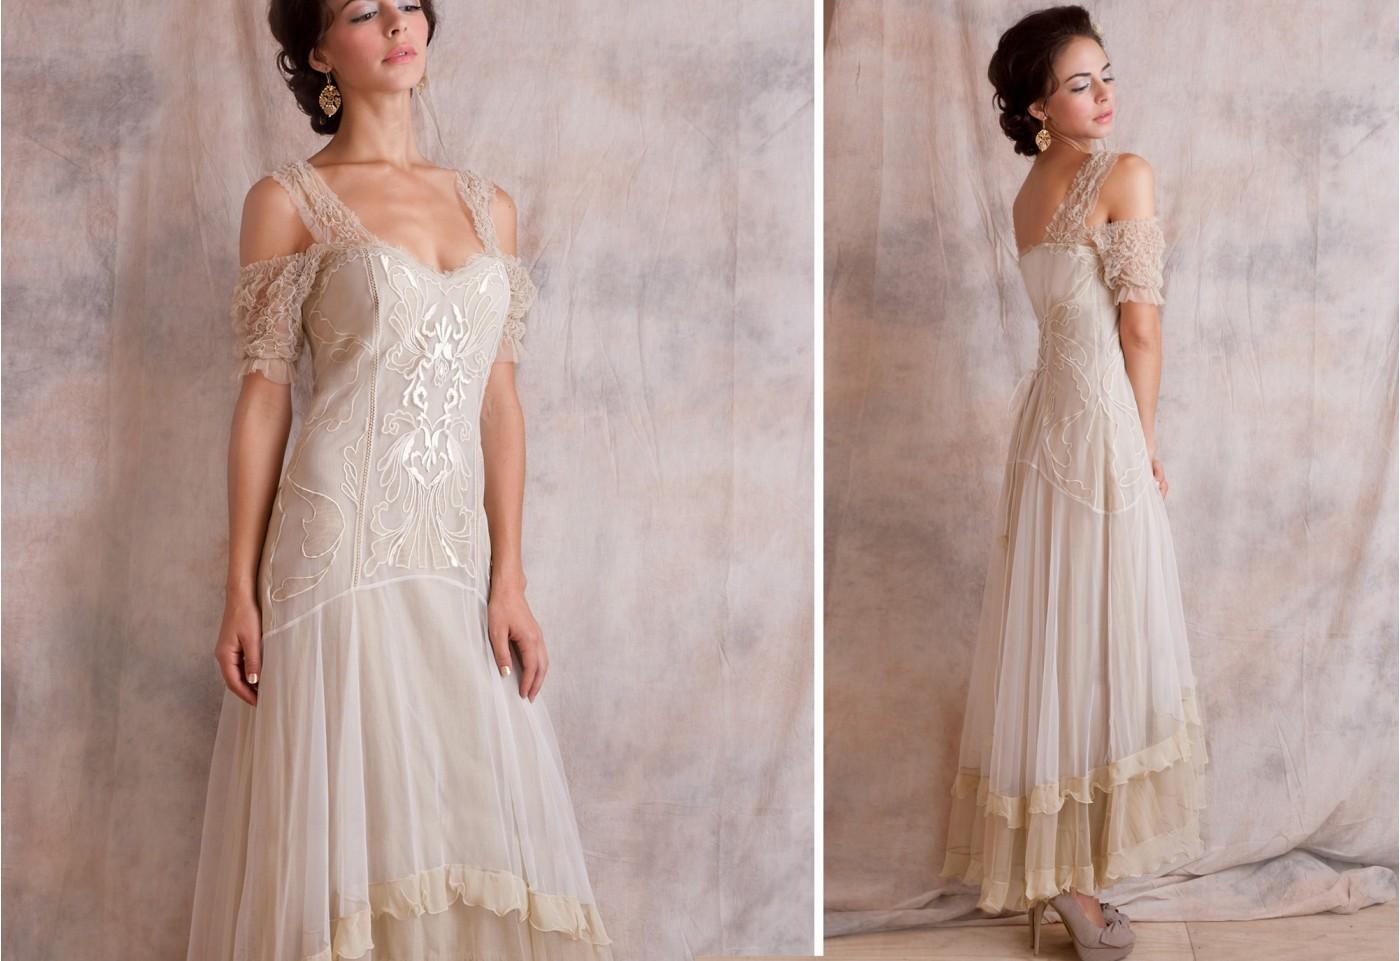 Simple Wedding Dresses Over 40: Abiti Sposa Seconde Nozze4